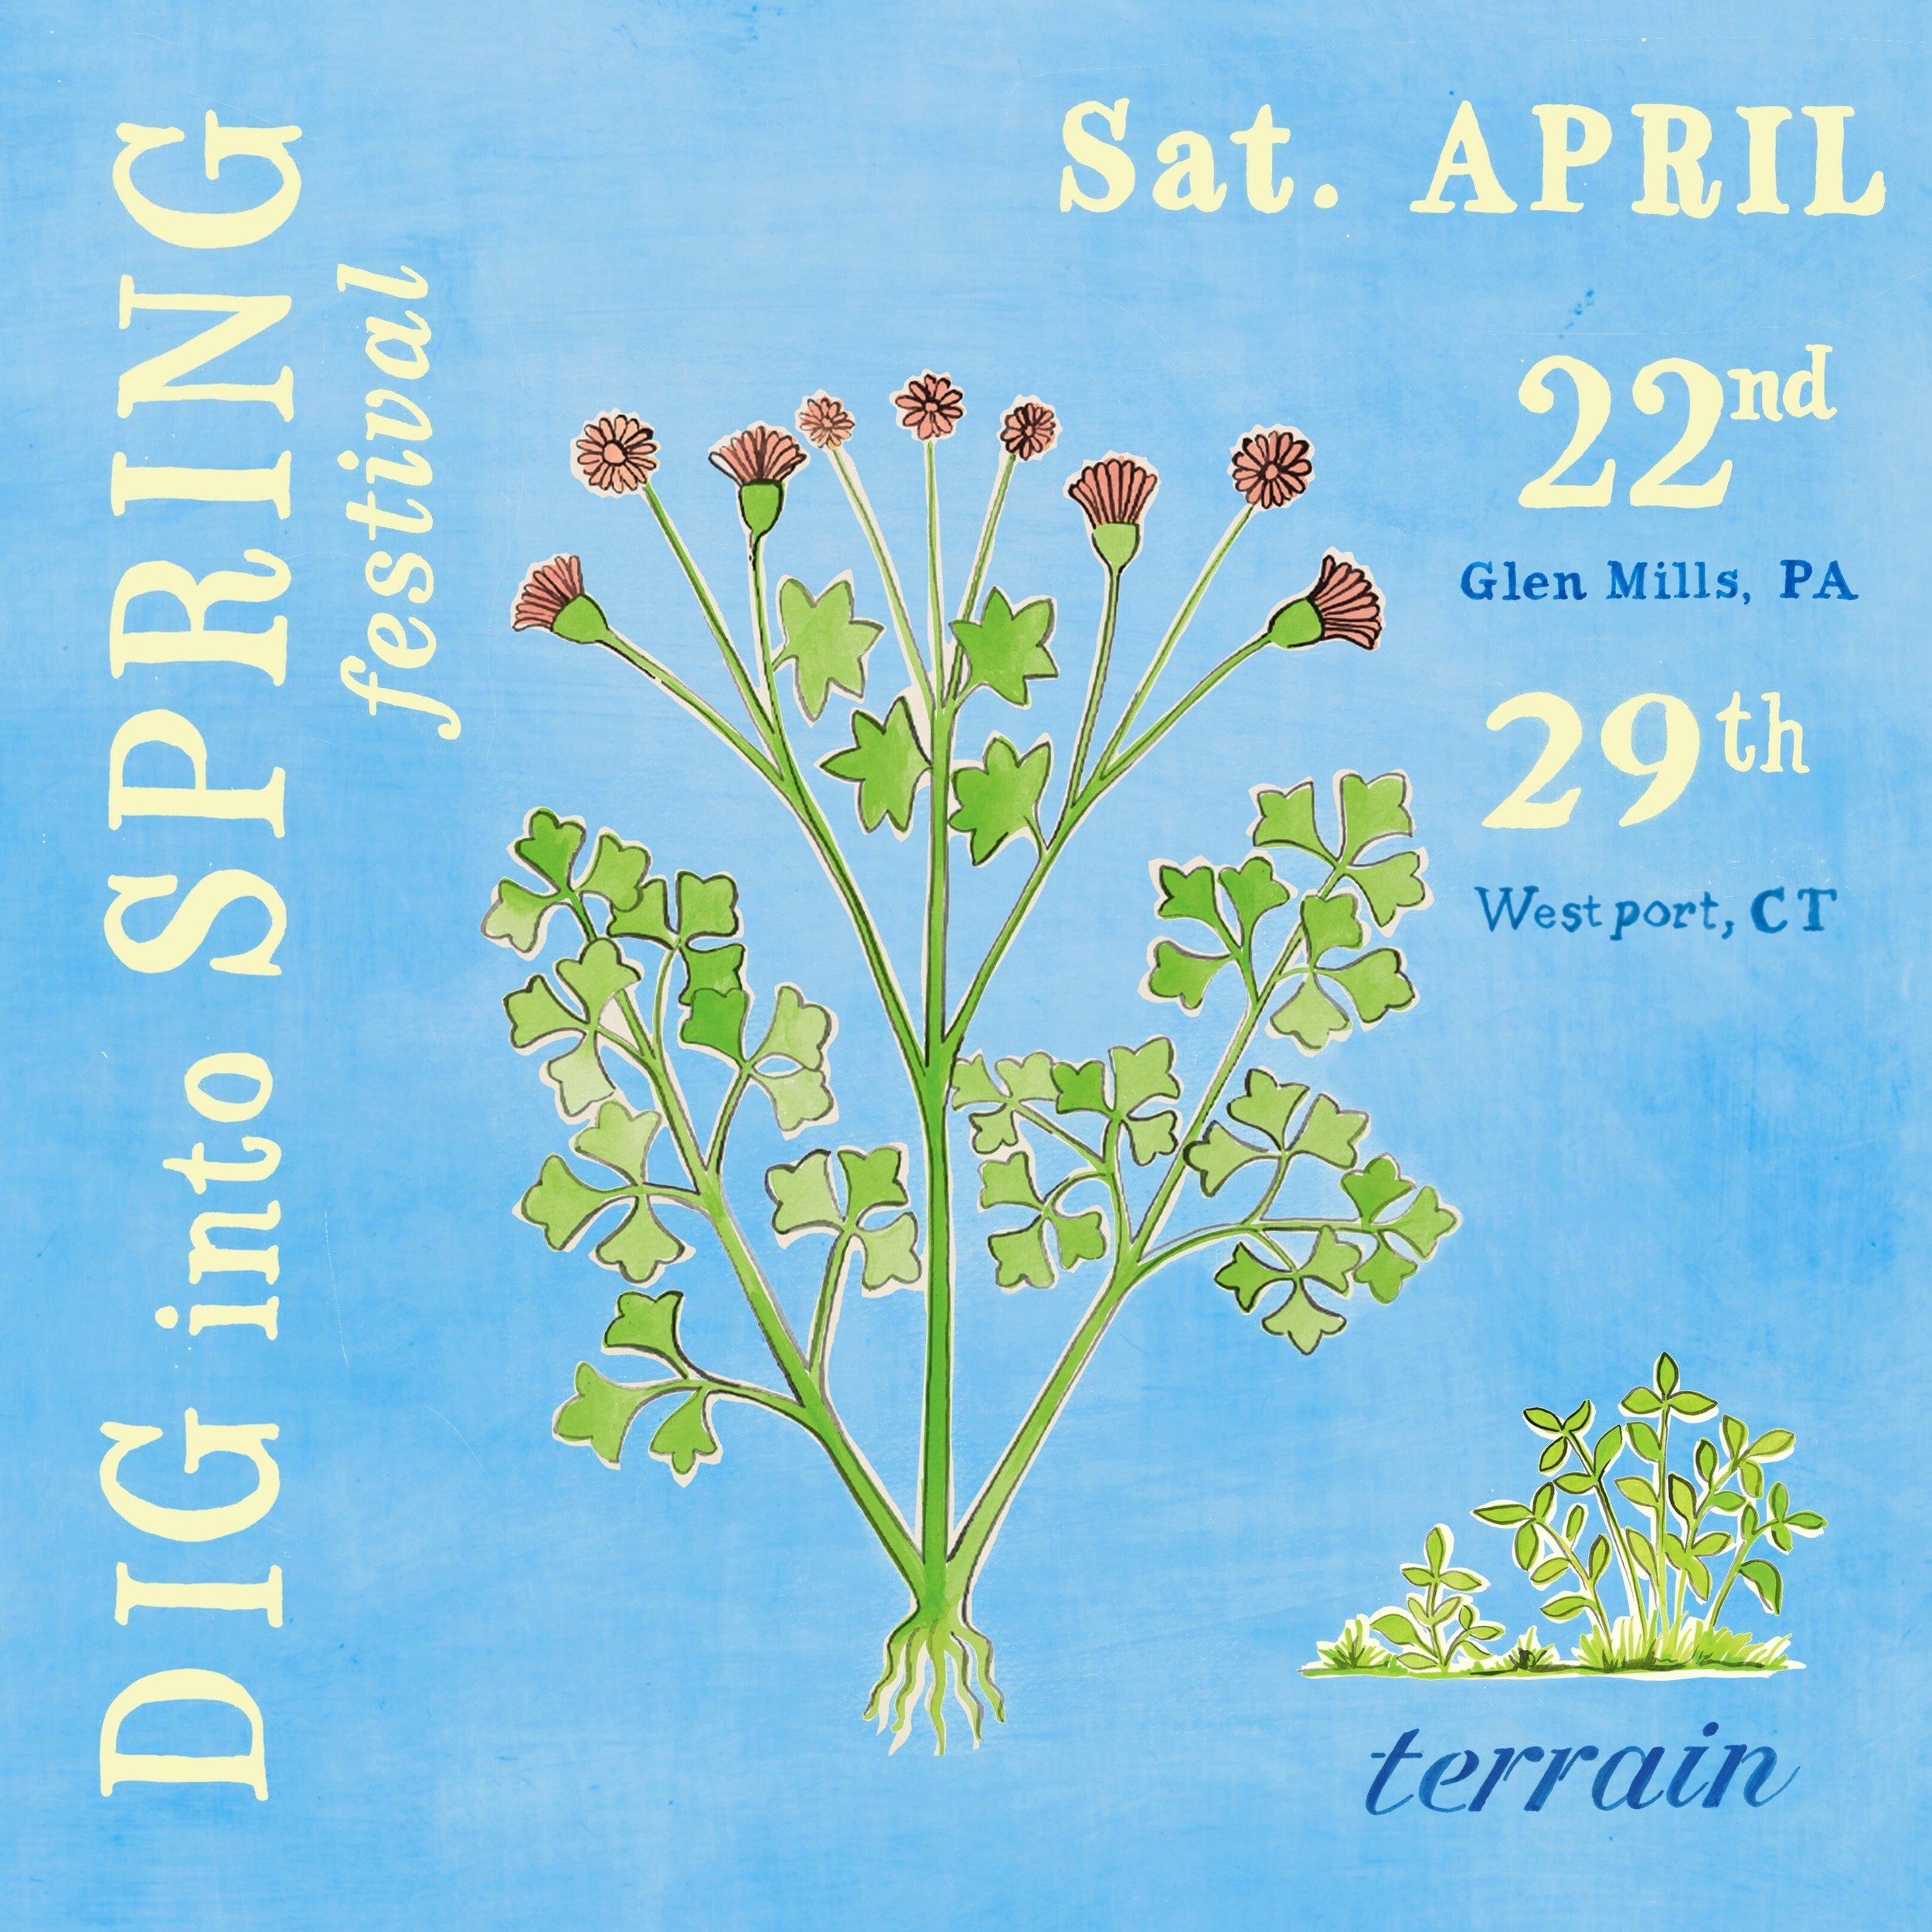 Dig_into_spring